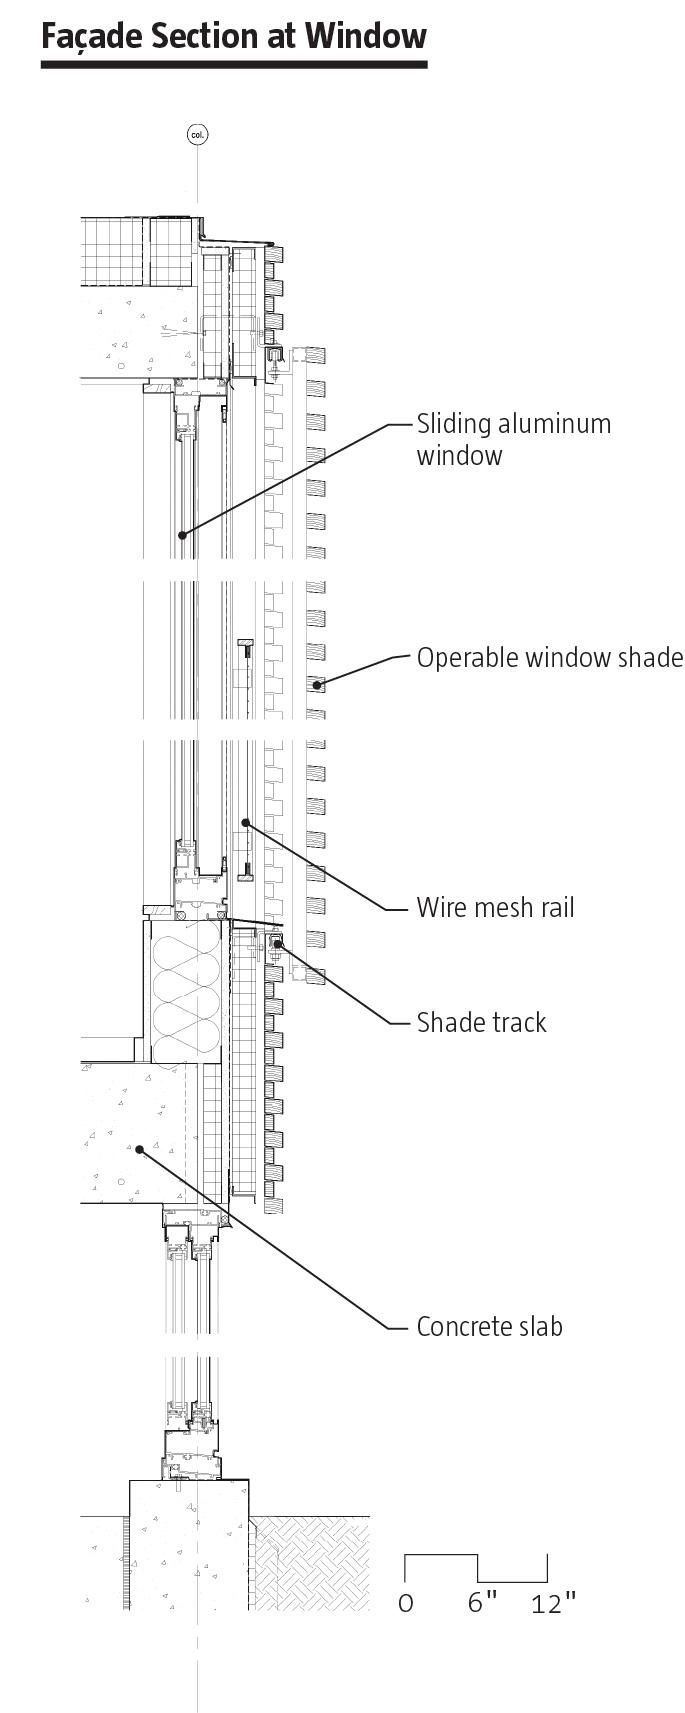 Facade Section at Window  Housing Tower at Kripalu Center | Stockbridge, Mass. | Peter Rose + Partners